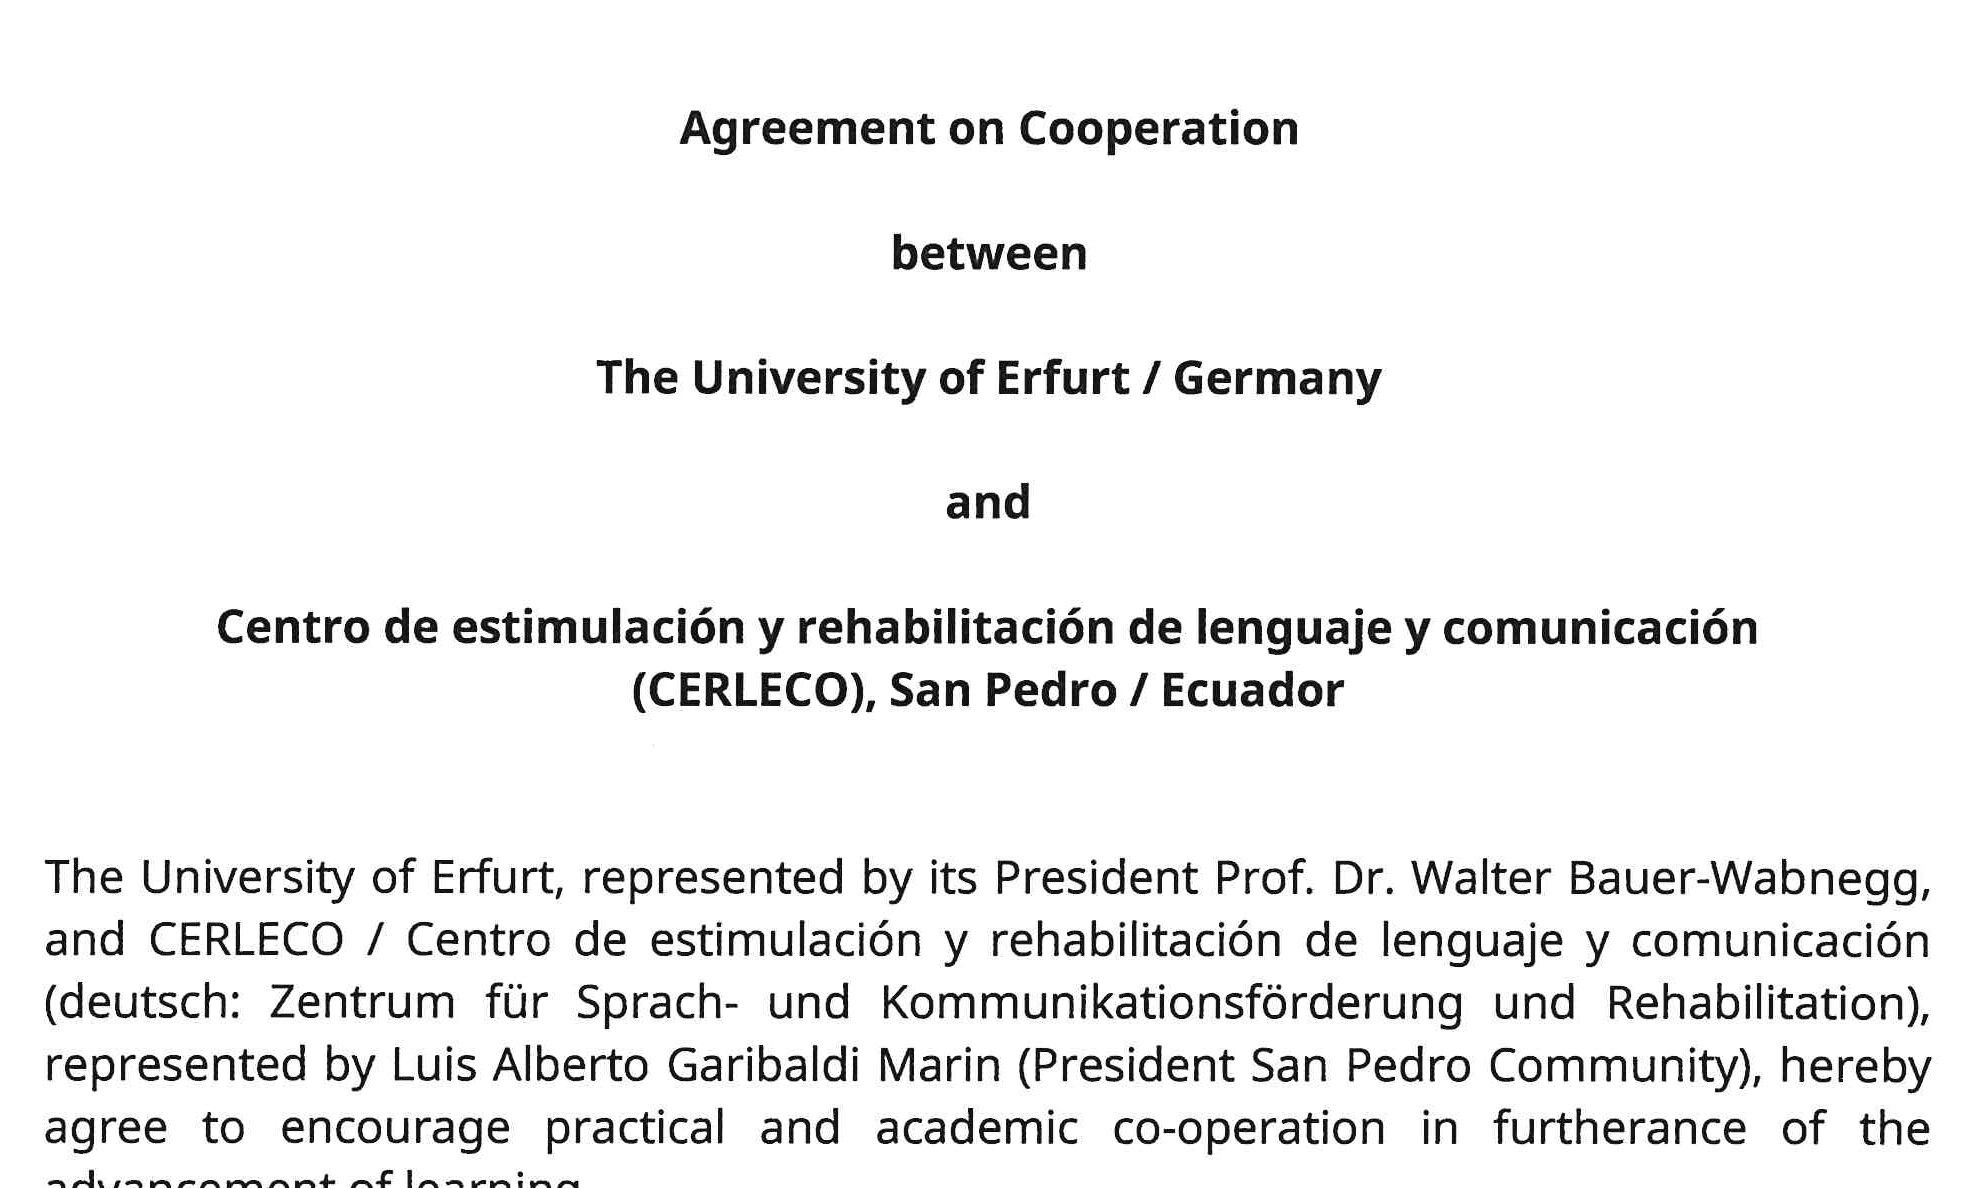 firma del contrato/Sign of contract/Vertragsunterzeichnung